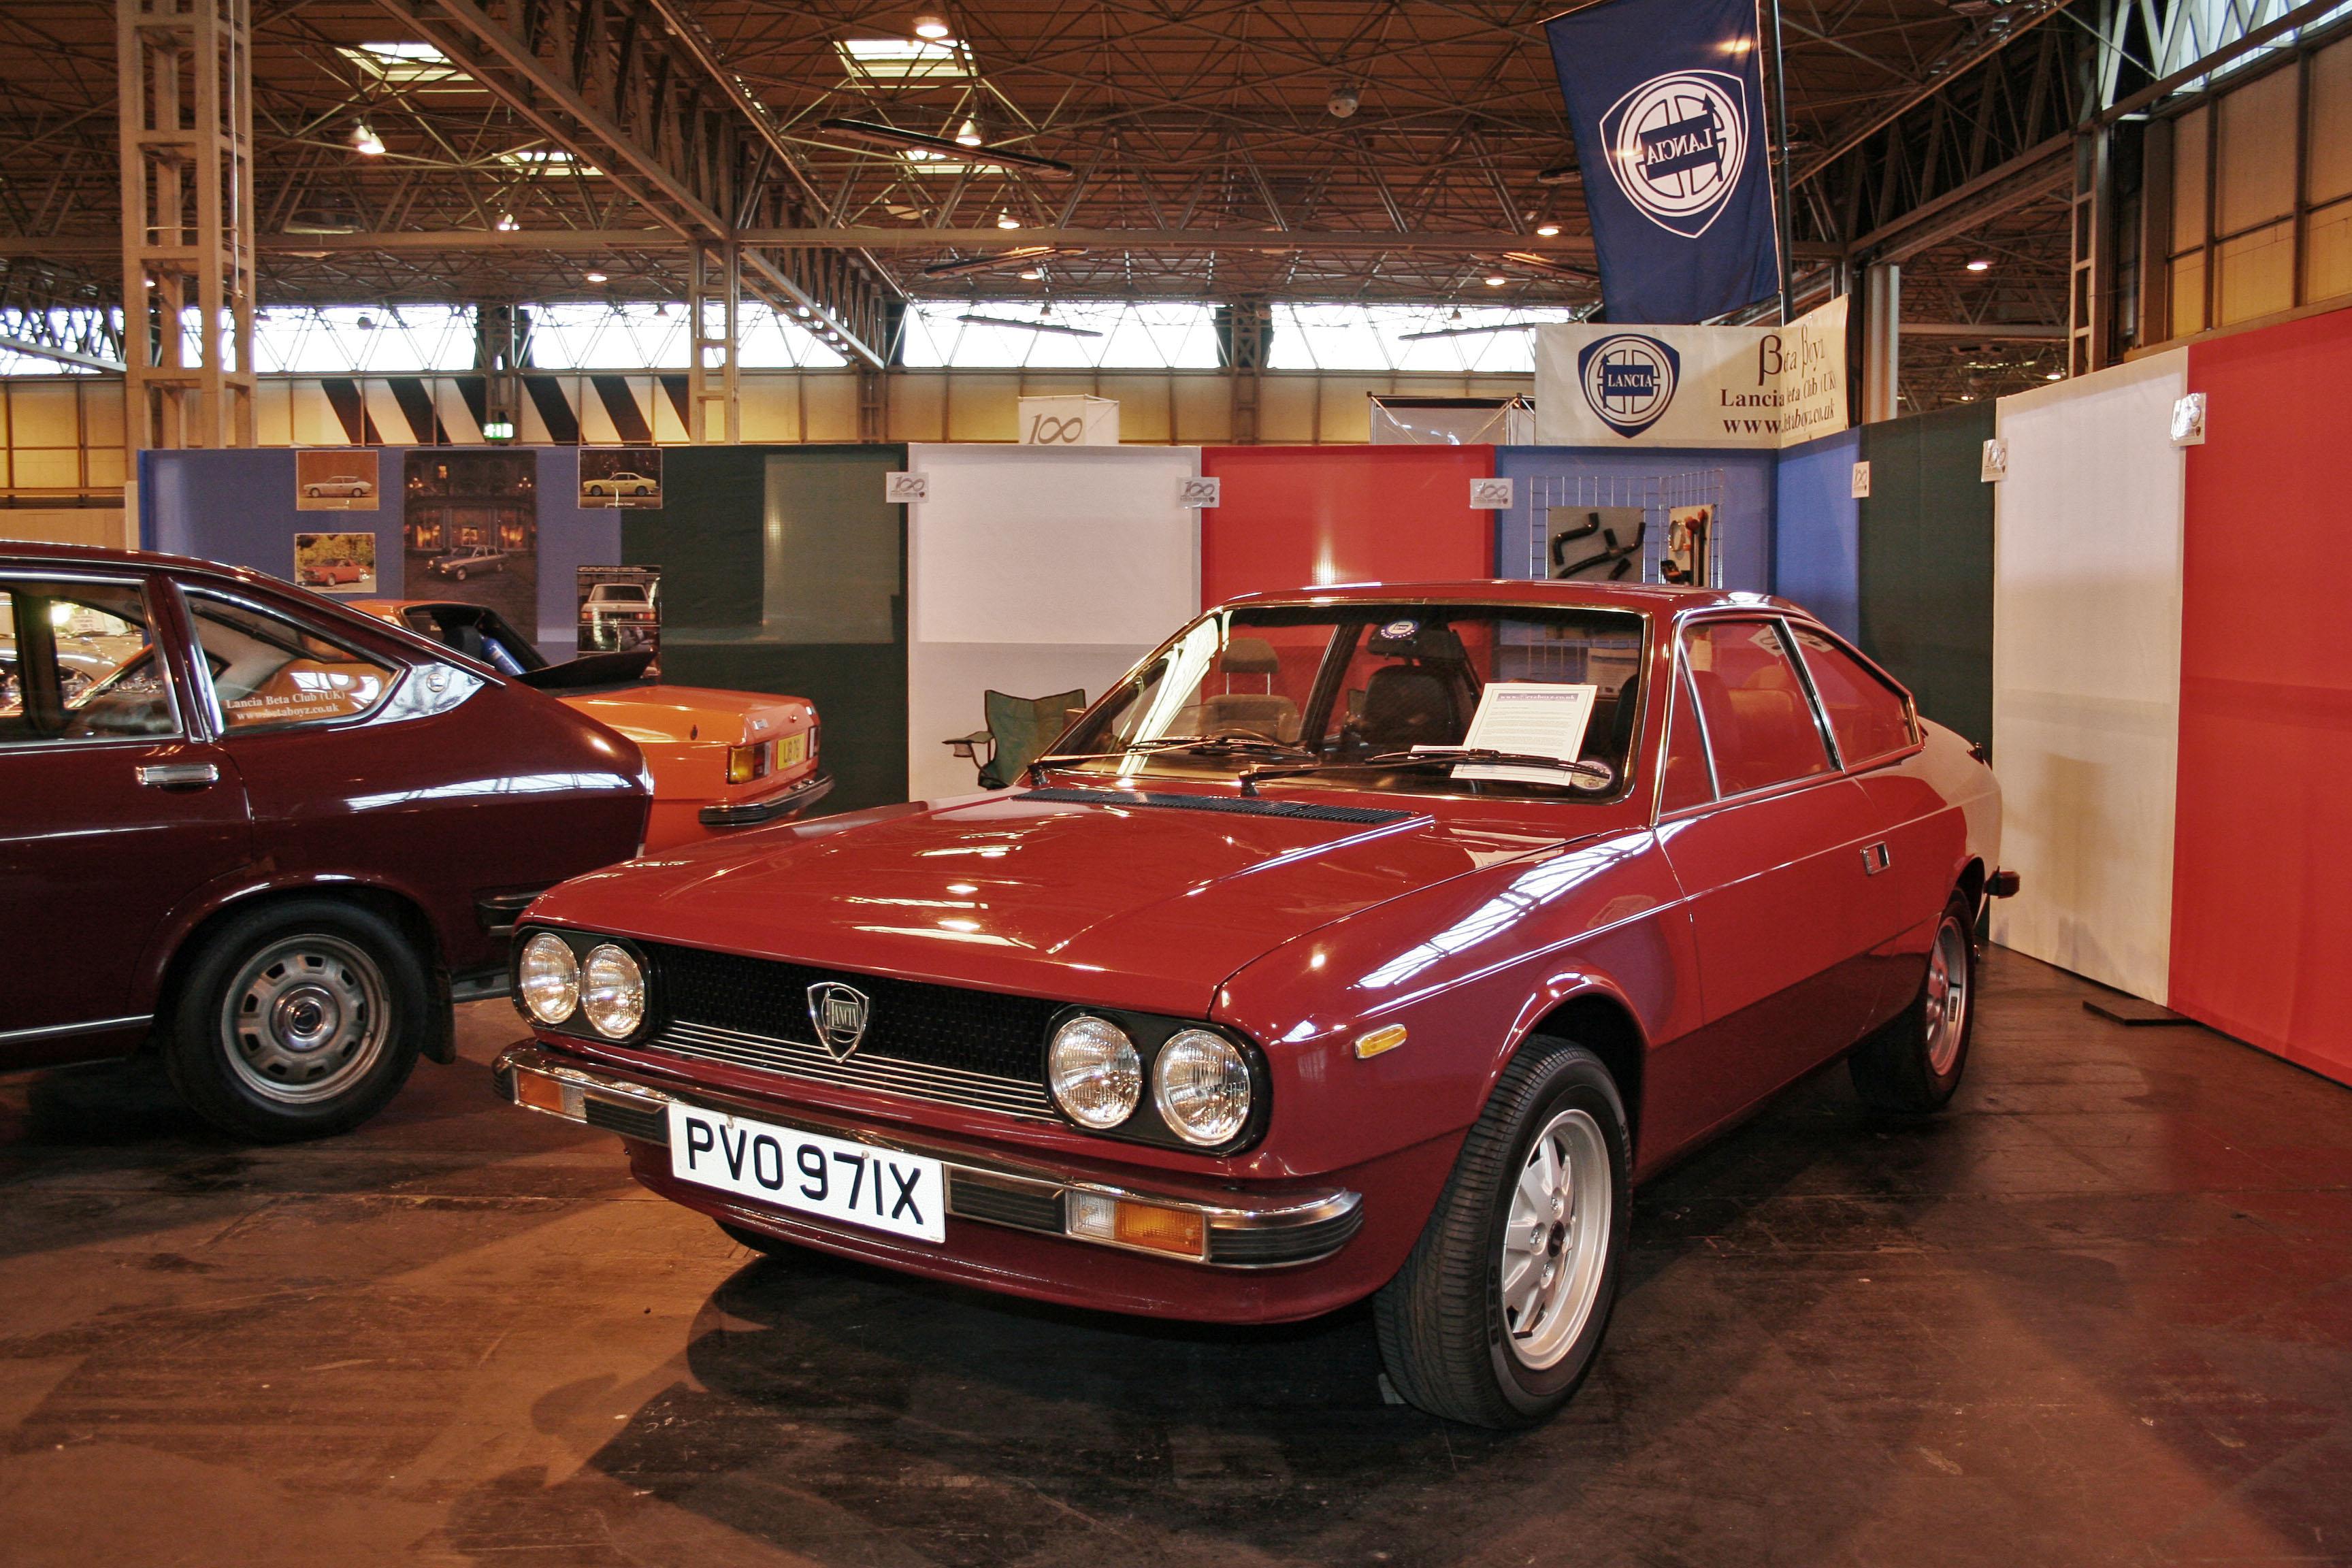 Worksheet. File1981 Lancia Beta Coupe 2000  Flickr  tonylanciabetajpg